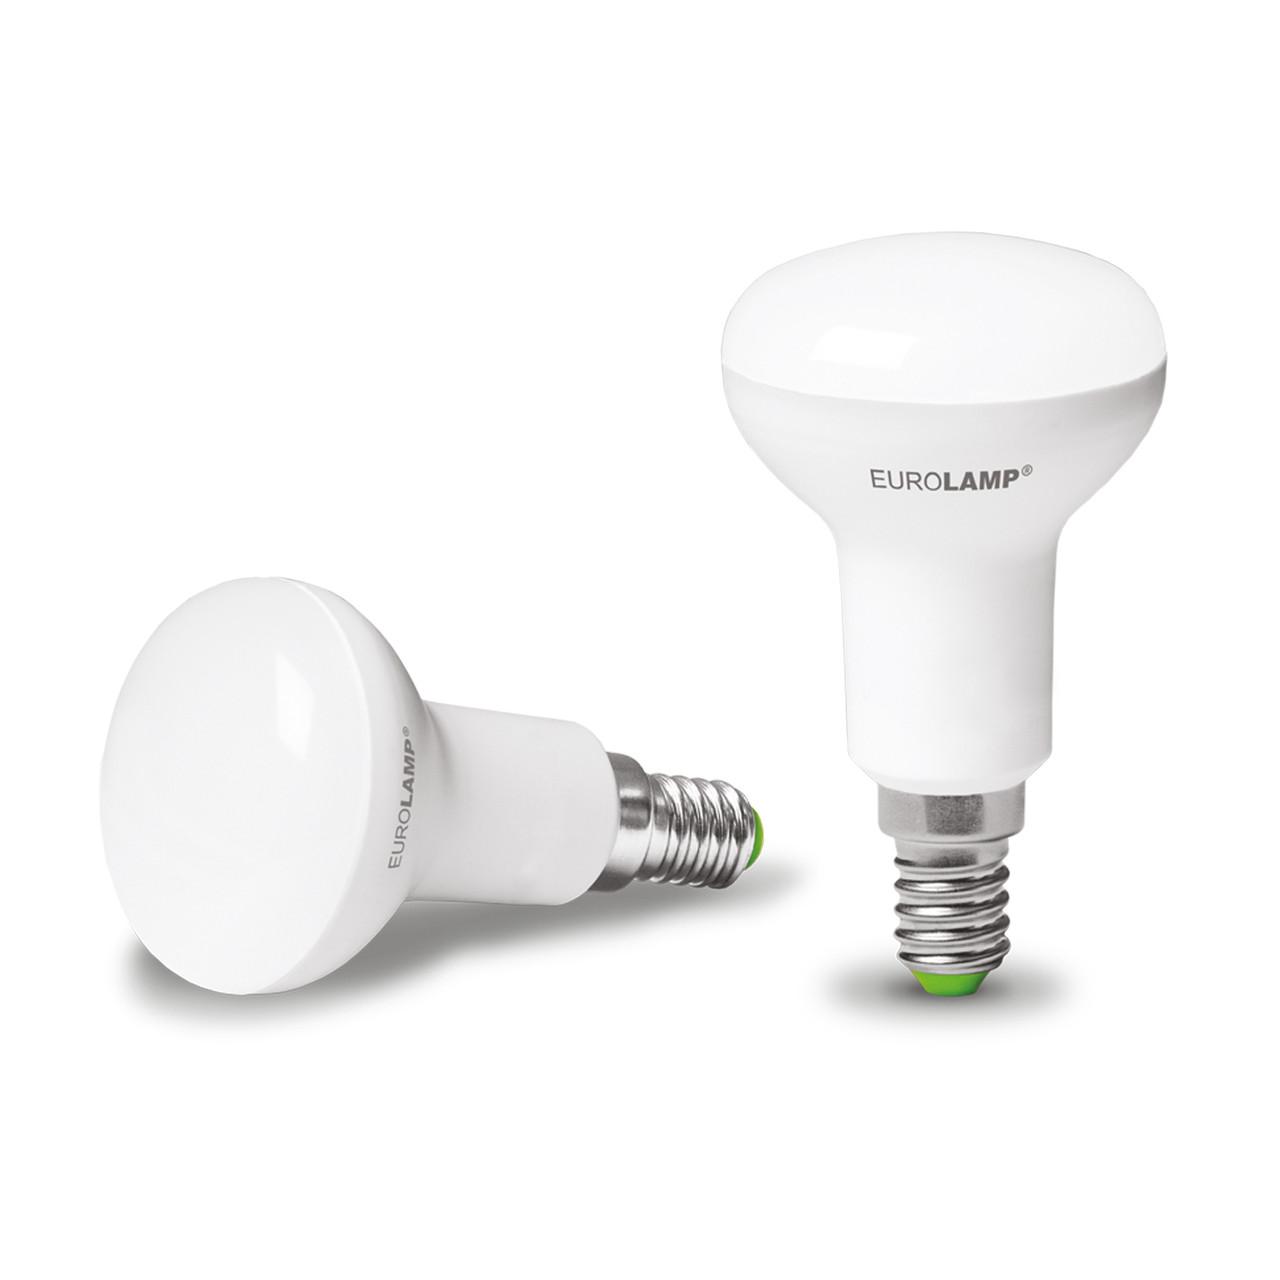 EUROLAMP LED Лампа ЕКО R50 6W E14 3000K